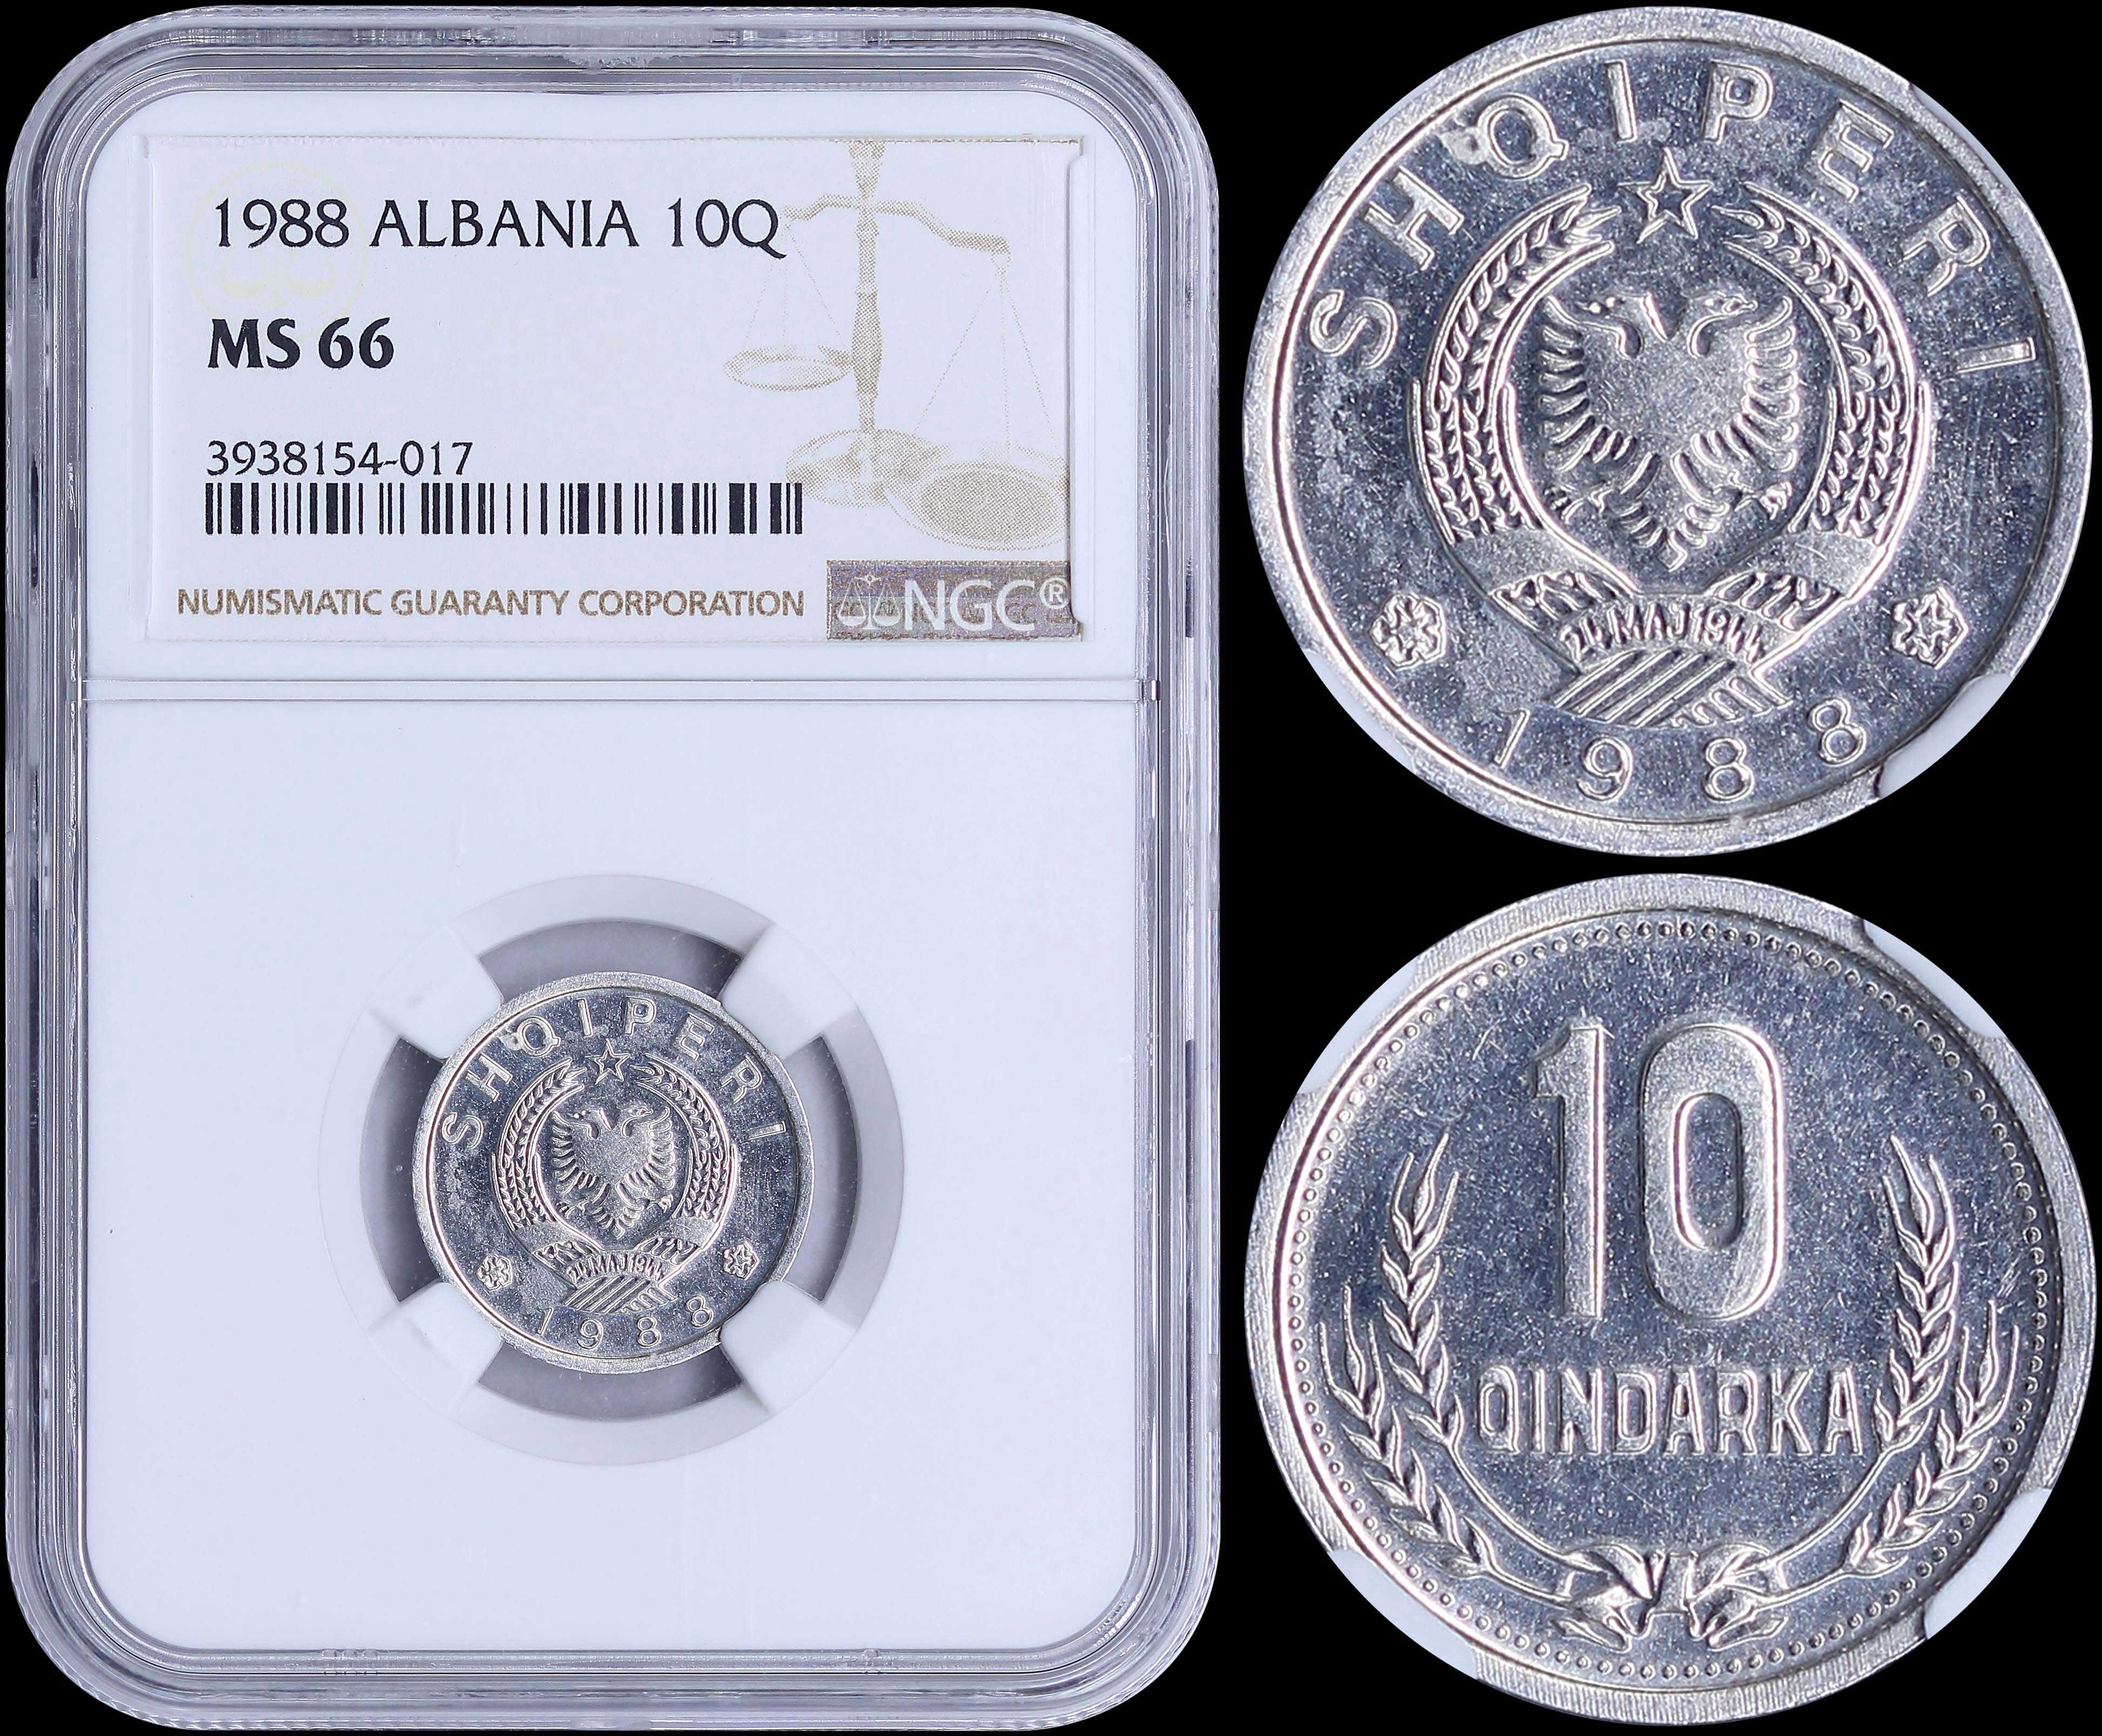 Lot 6776 - -  COINS & TOKENS COINS & TOKENS OF EUROPEAN COUNTRIES -  A. Karamitsos Postal & Live Internet Auction 984 (Part B)